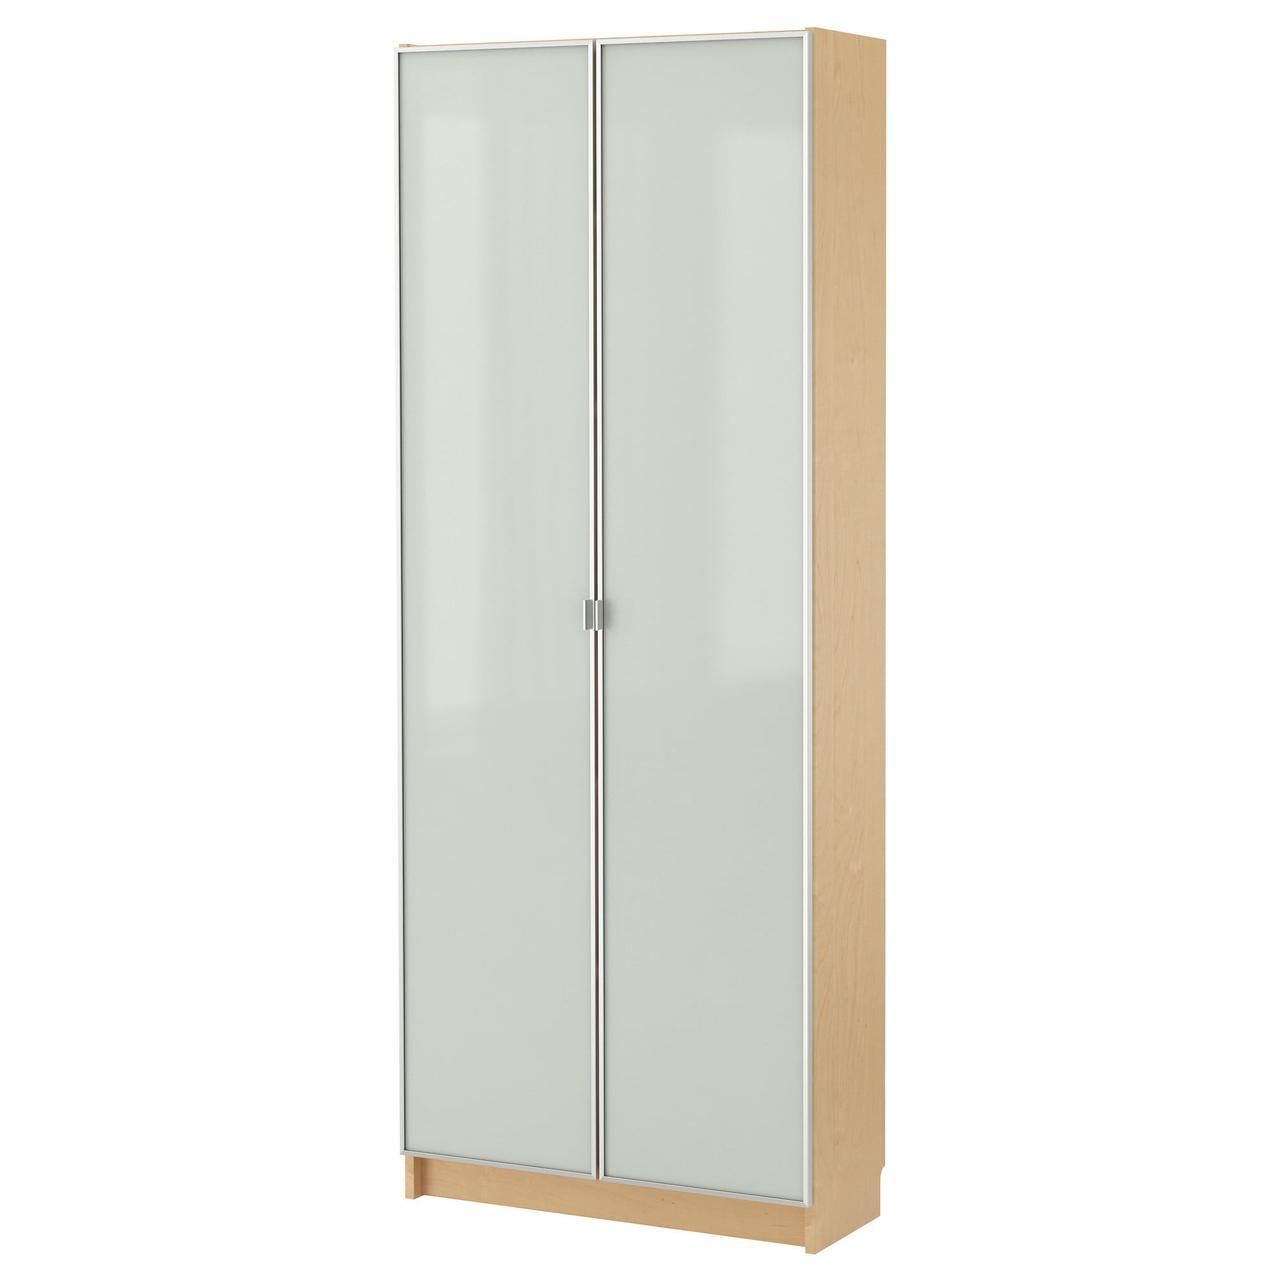 ✅ IKEA BILLY / MORLIDEN (390.234.06) Шкаф